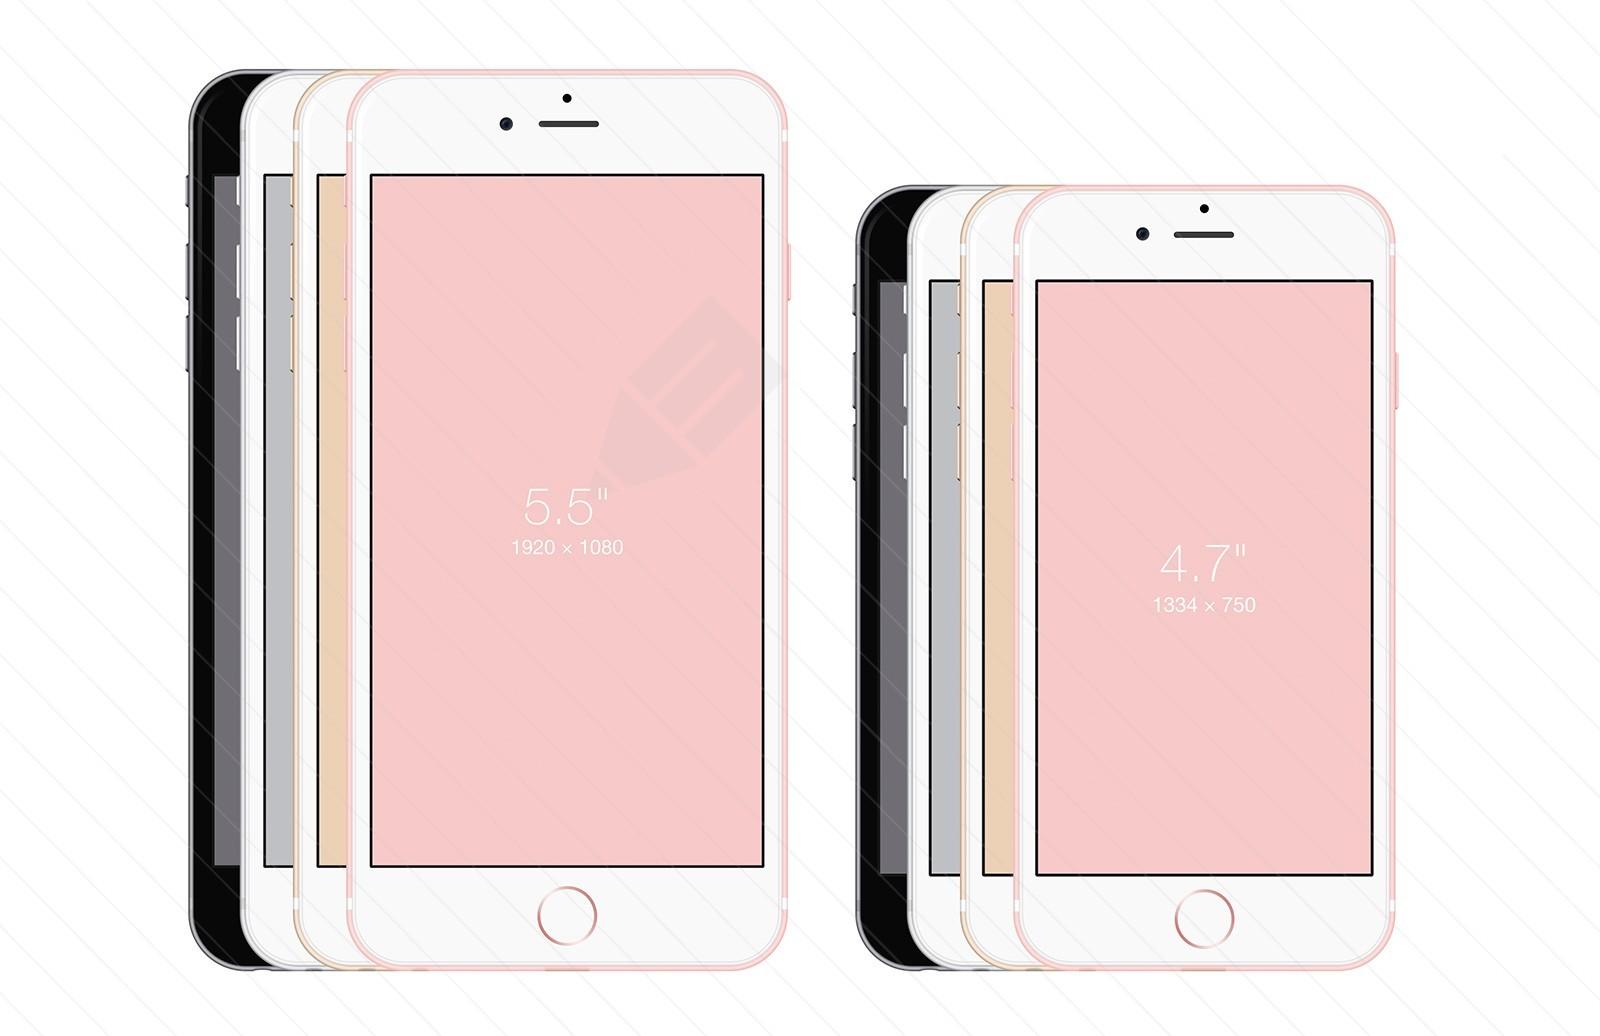 iPhone 6S - Free PSD Mockup